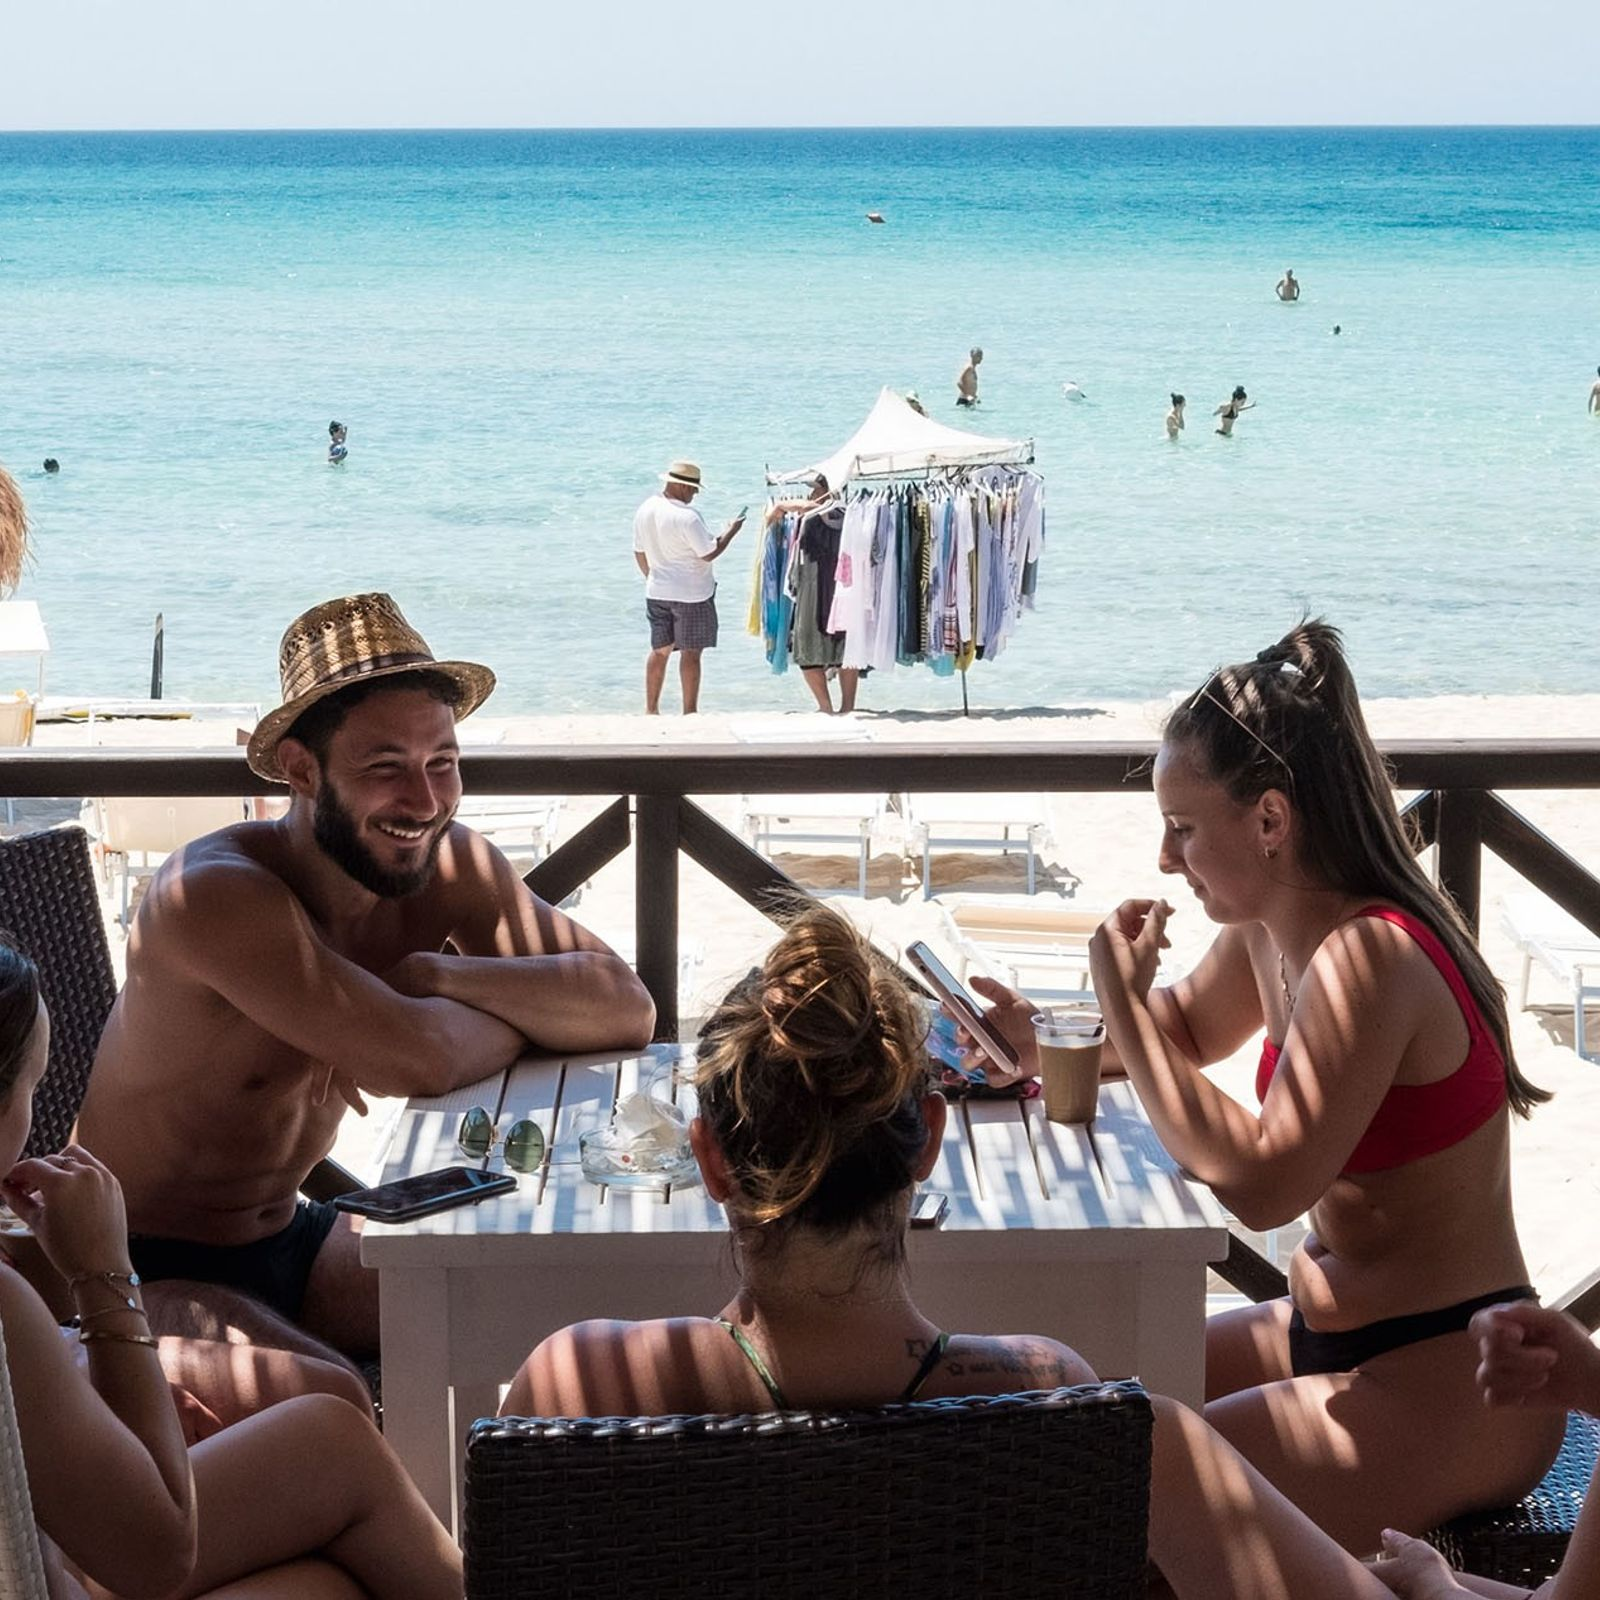 Locals share coffee at a beach bar in Punta Prosciutto, on Puglia's west coast.